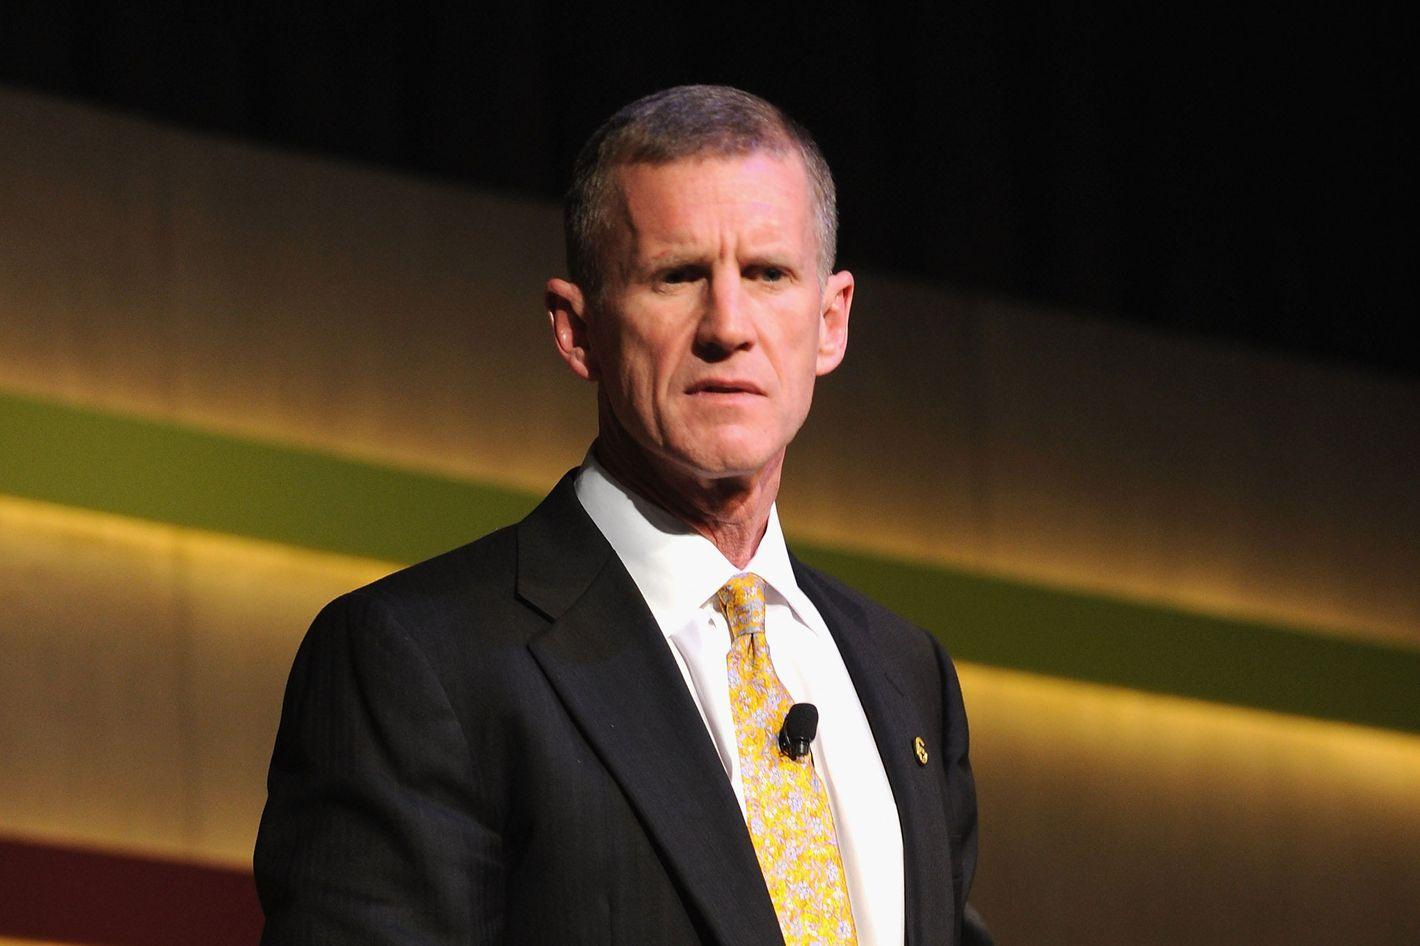 General Stanley McChrystal speaks at the Robin Hood Veterans Summit at Intrepid Sea-Air-Space Museum on May 7, 2012 in New York City.